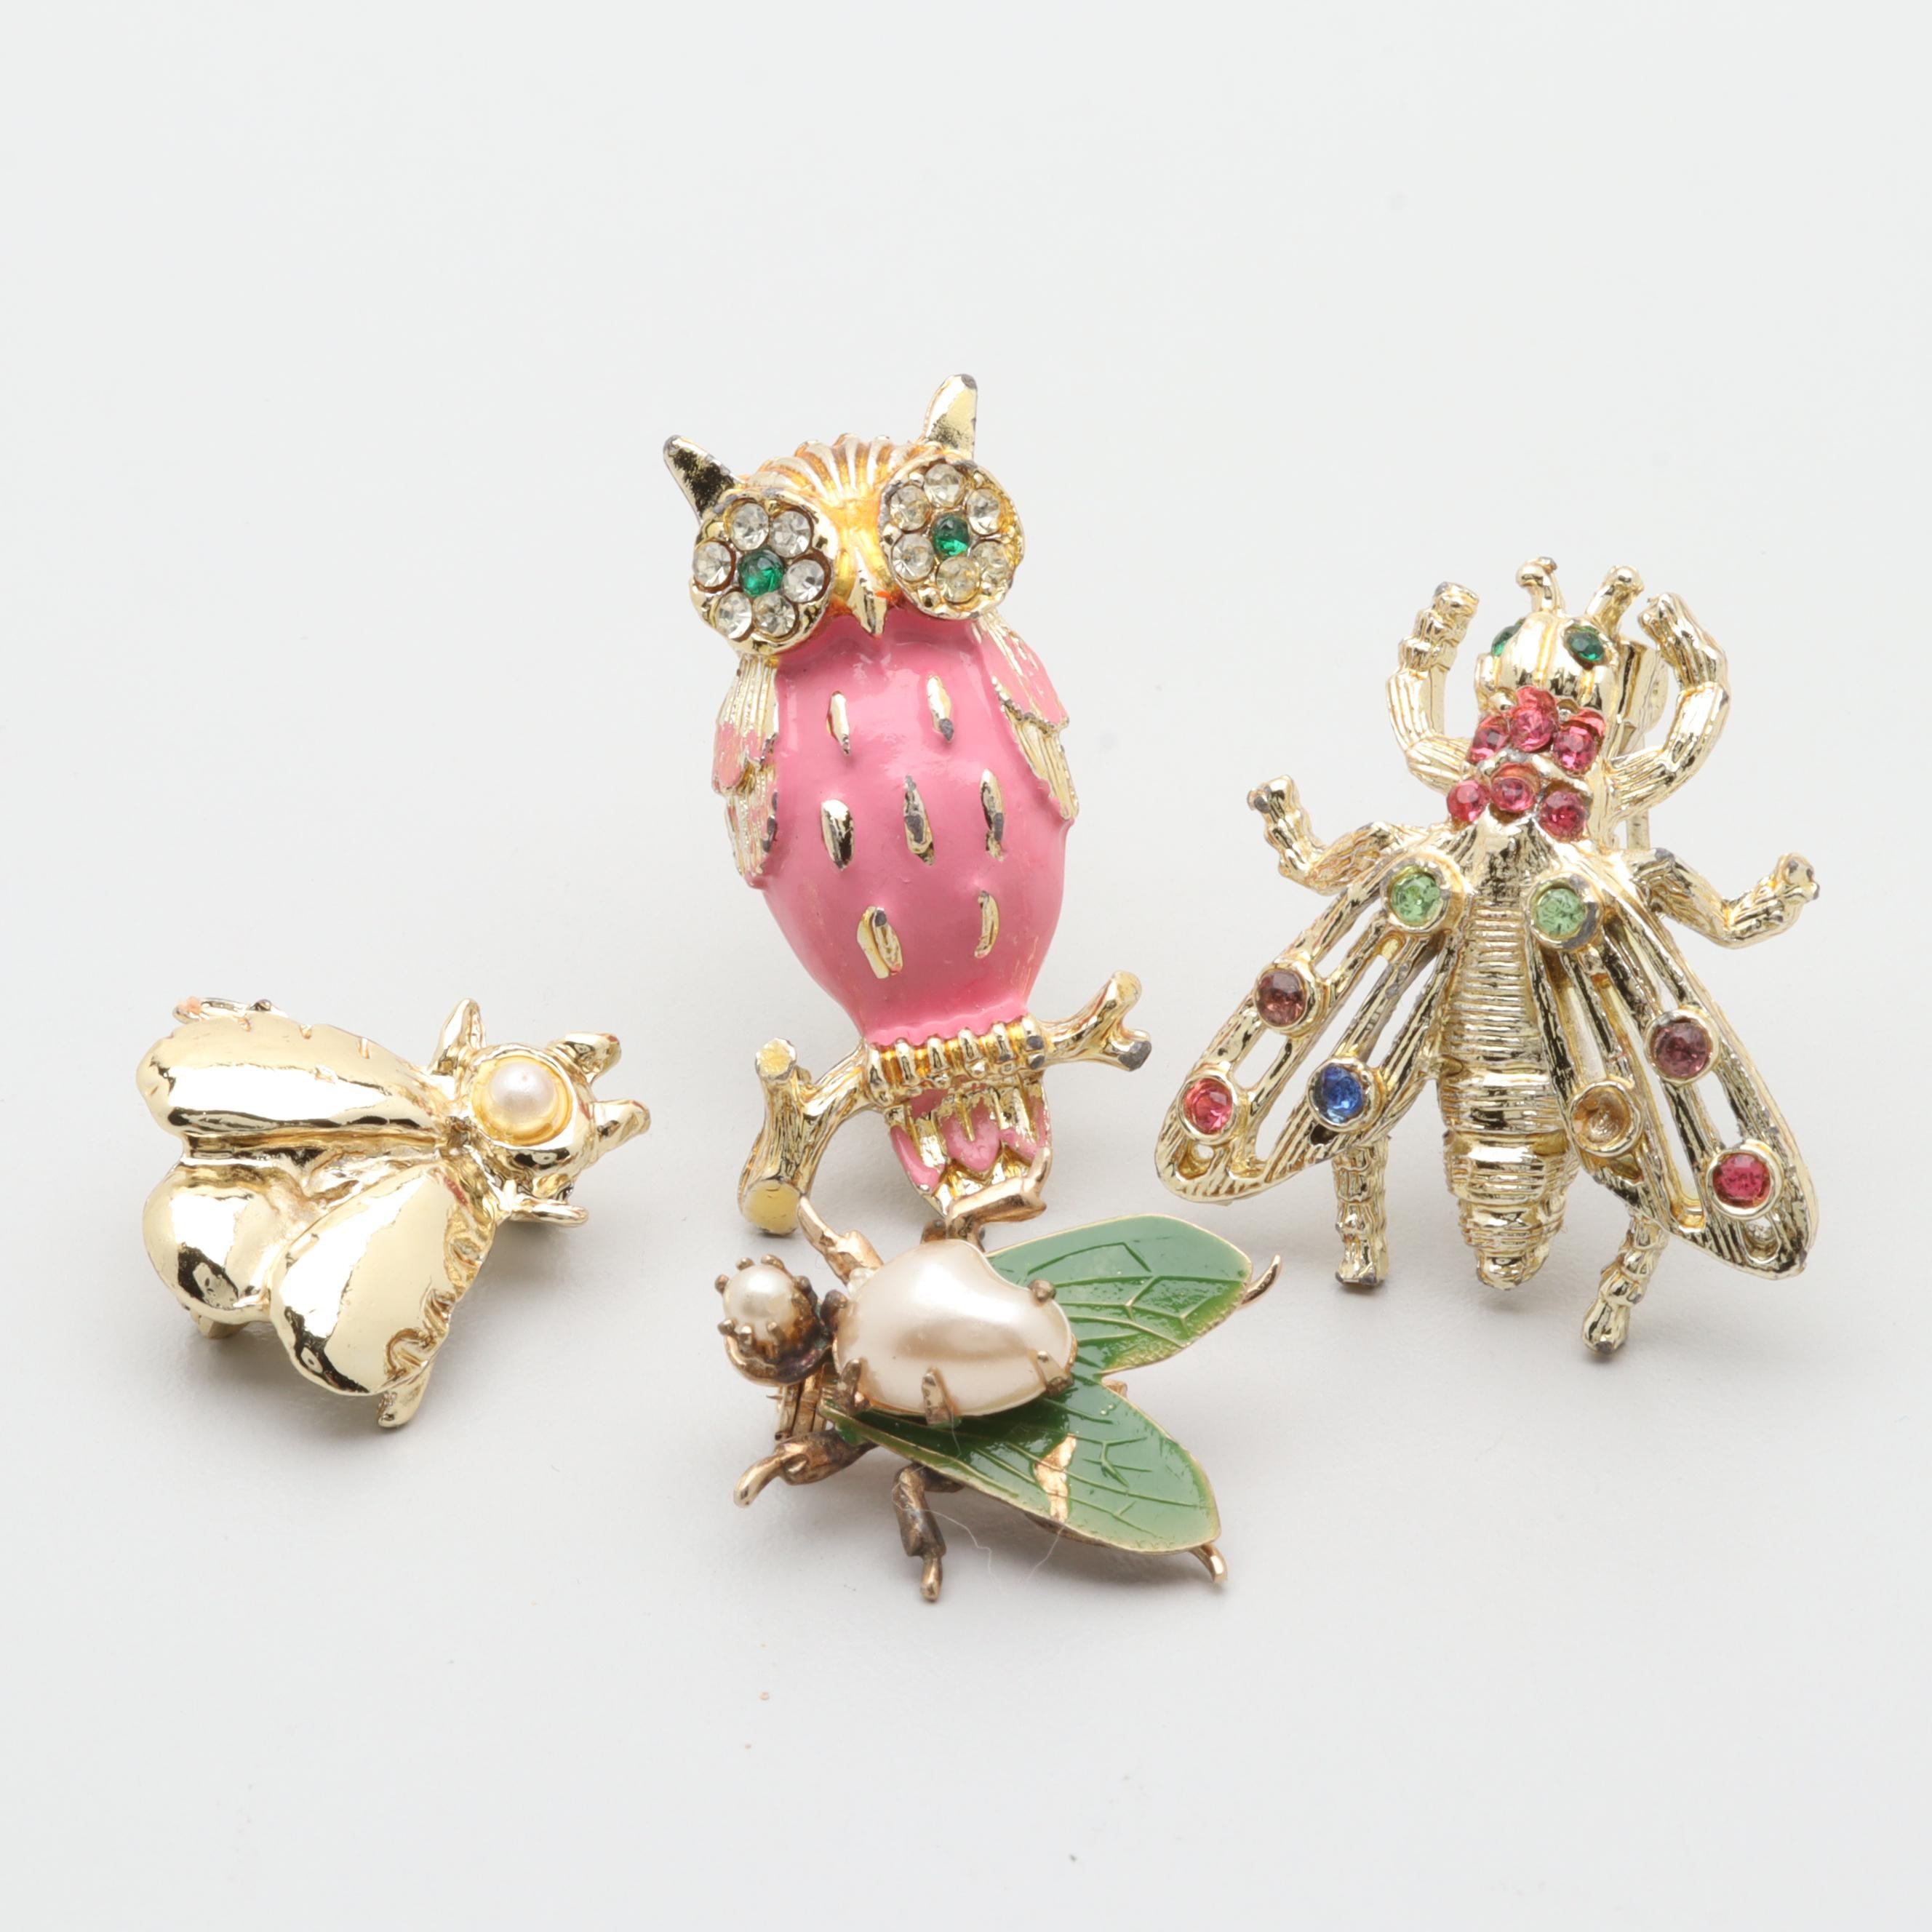 Gold Tone Imitation Pearl, Enamel, and Foilback Animal Brooch Selection